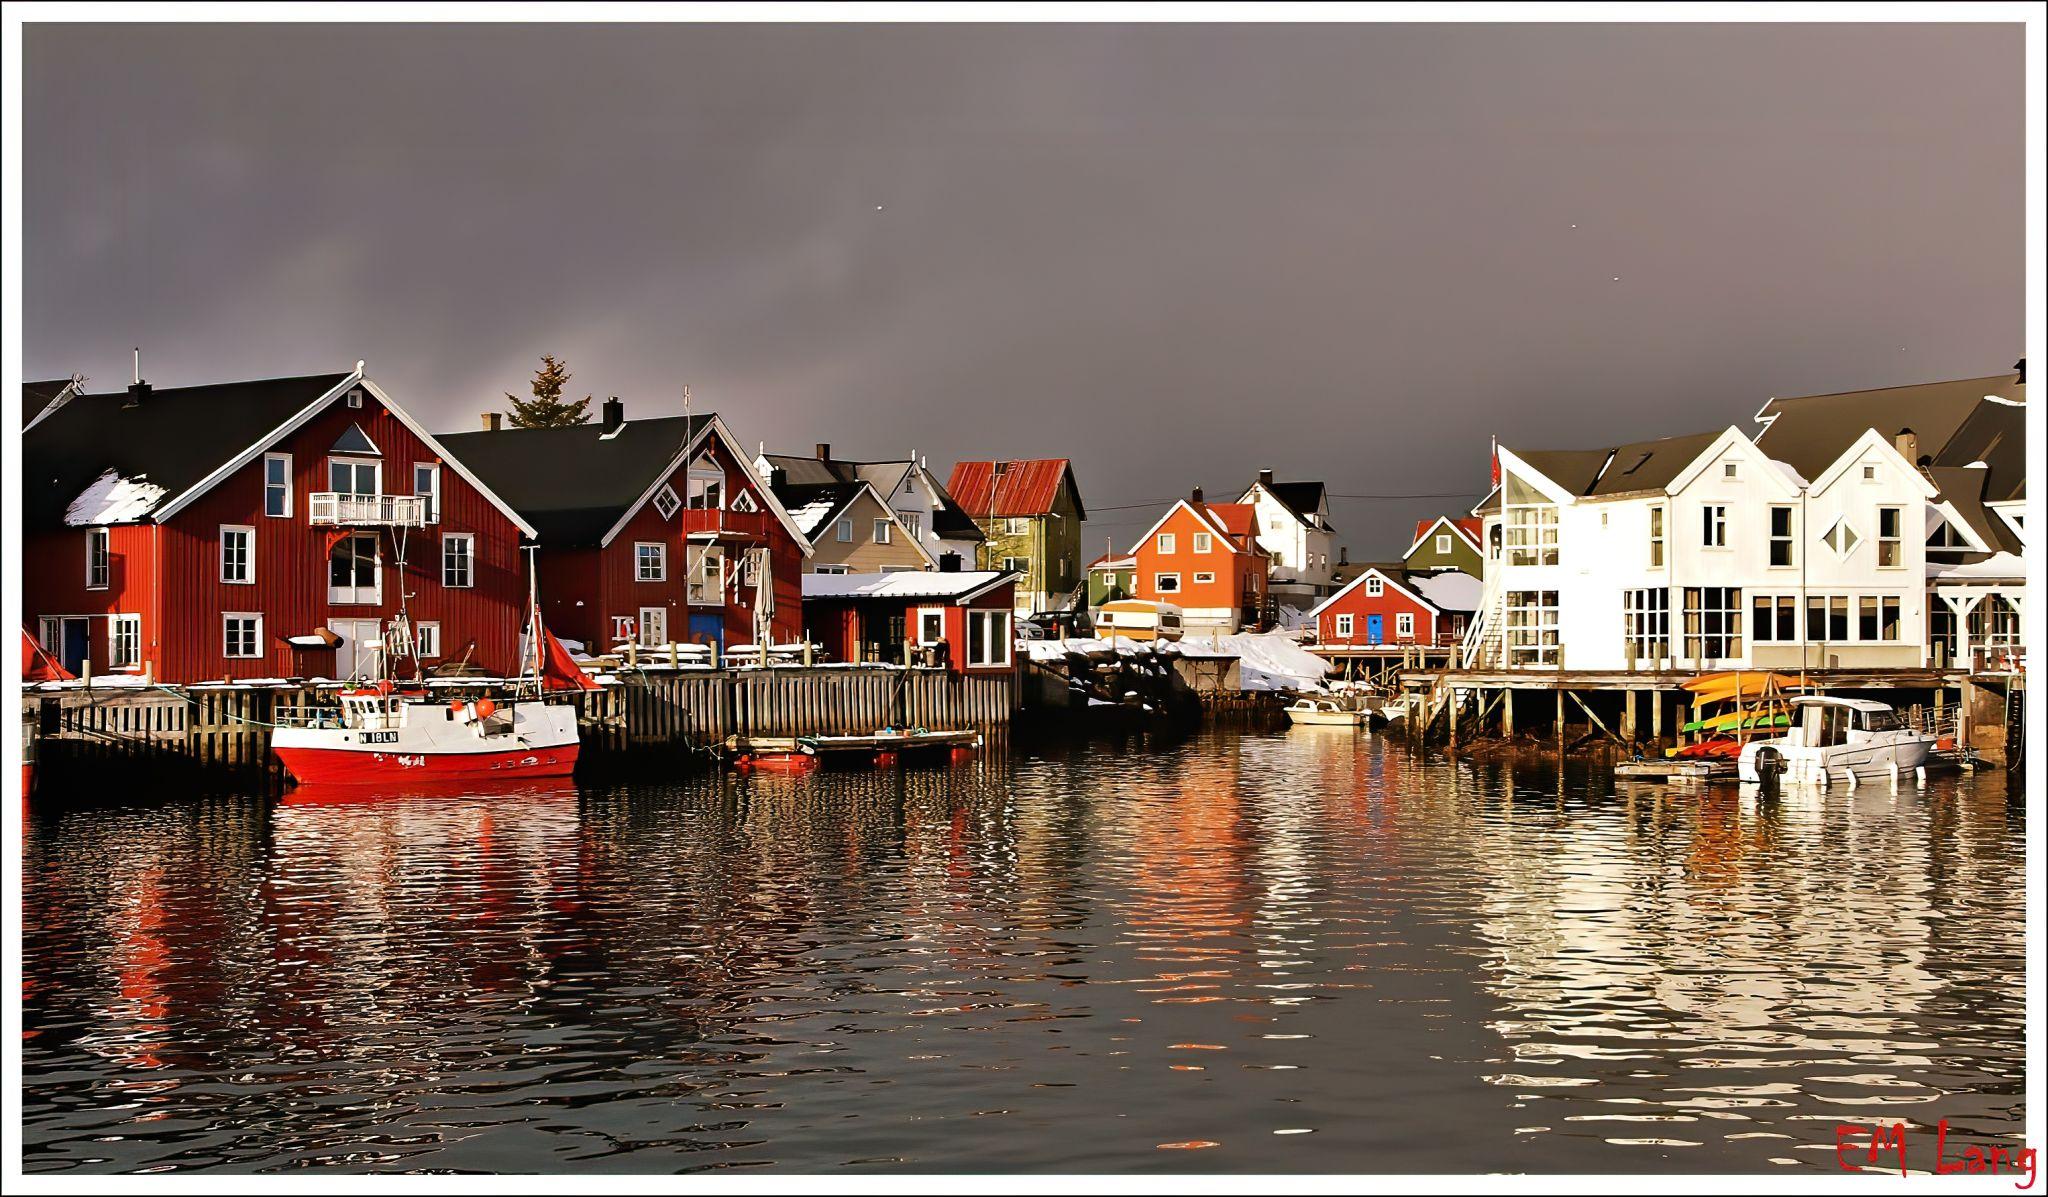 Henninvsvaer Fishing Village, Norway